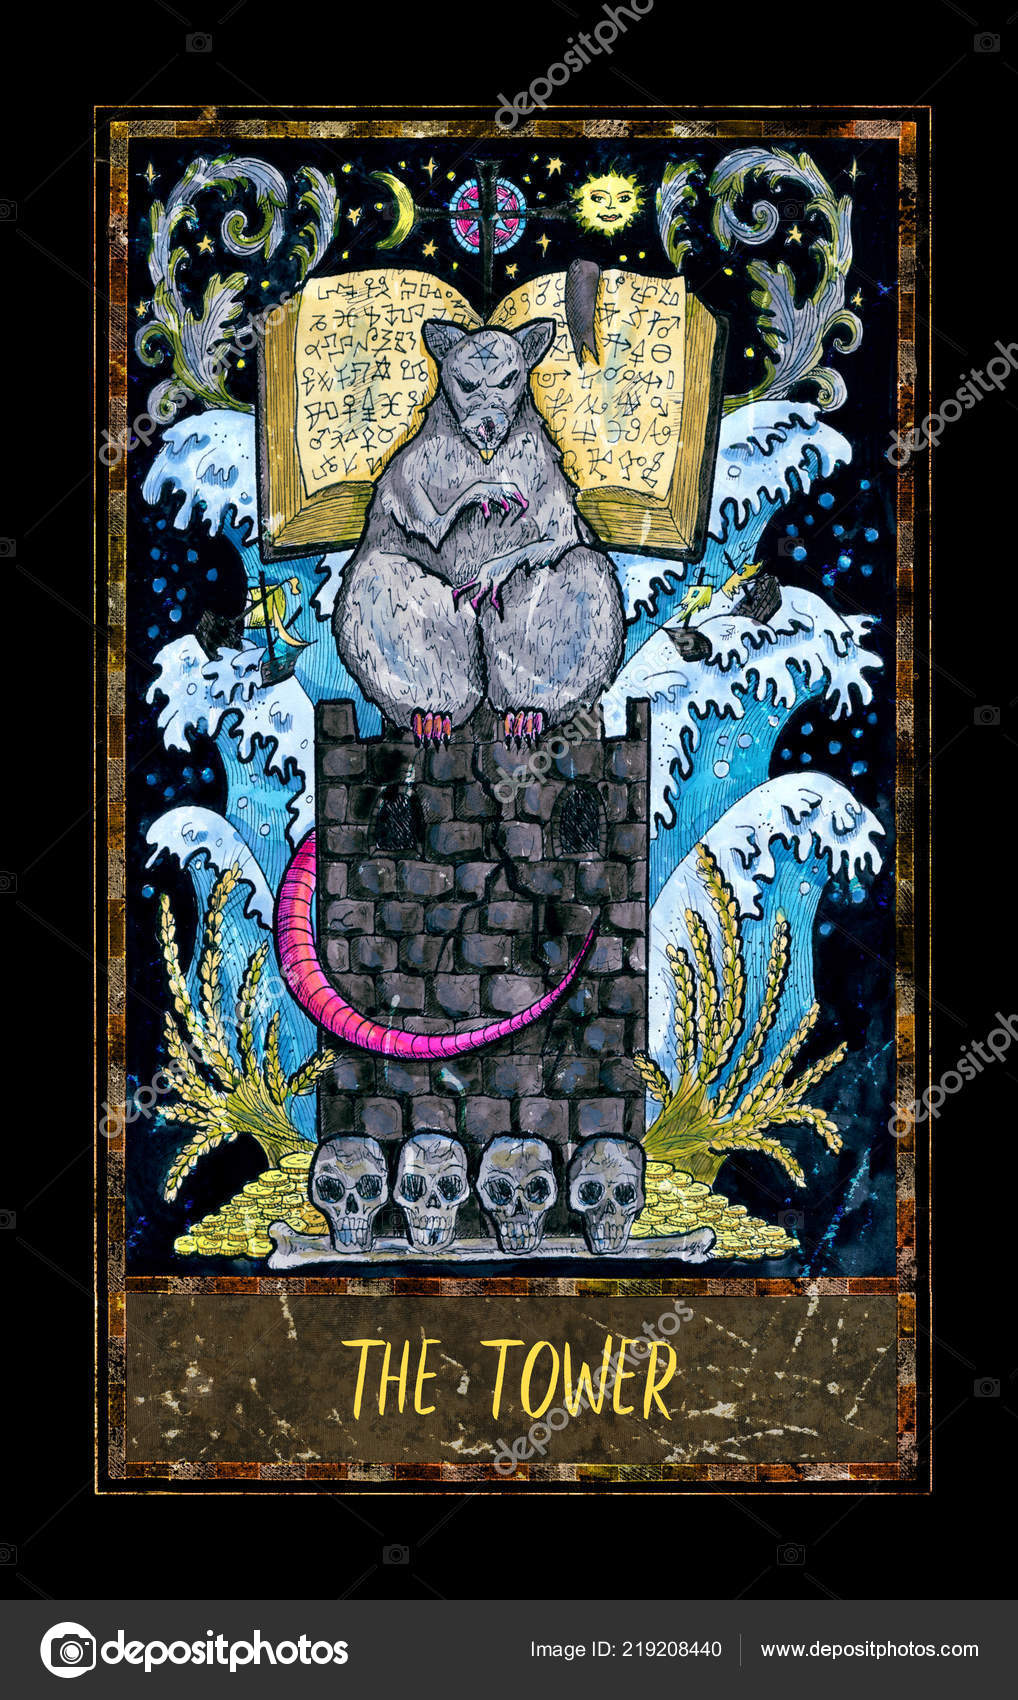 Tower Major Arcana Tarot Card Magic Gate Deck Fantasy